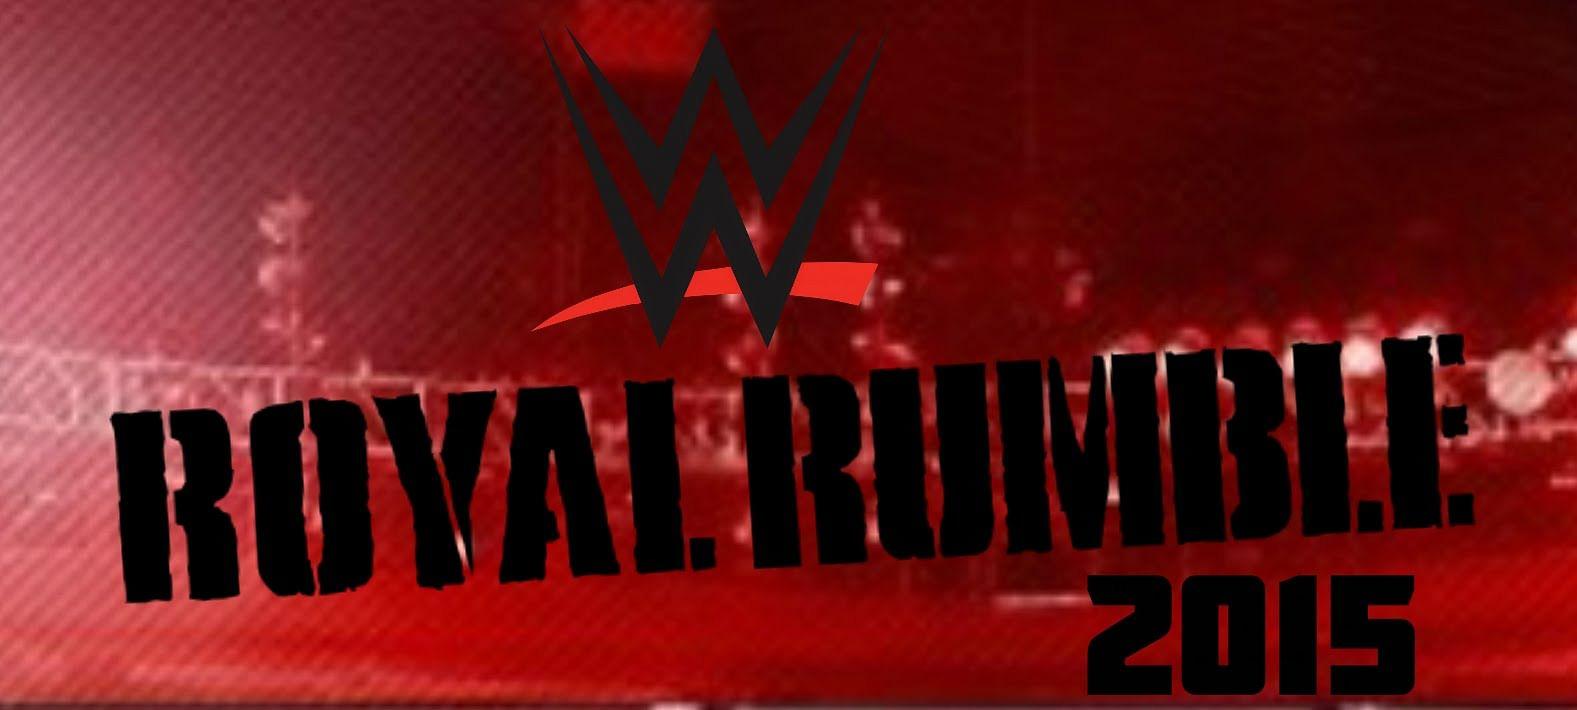 wwe confirm royal rumble 2015 details